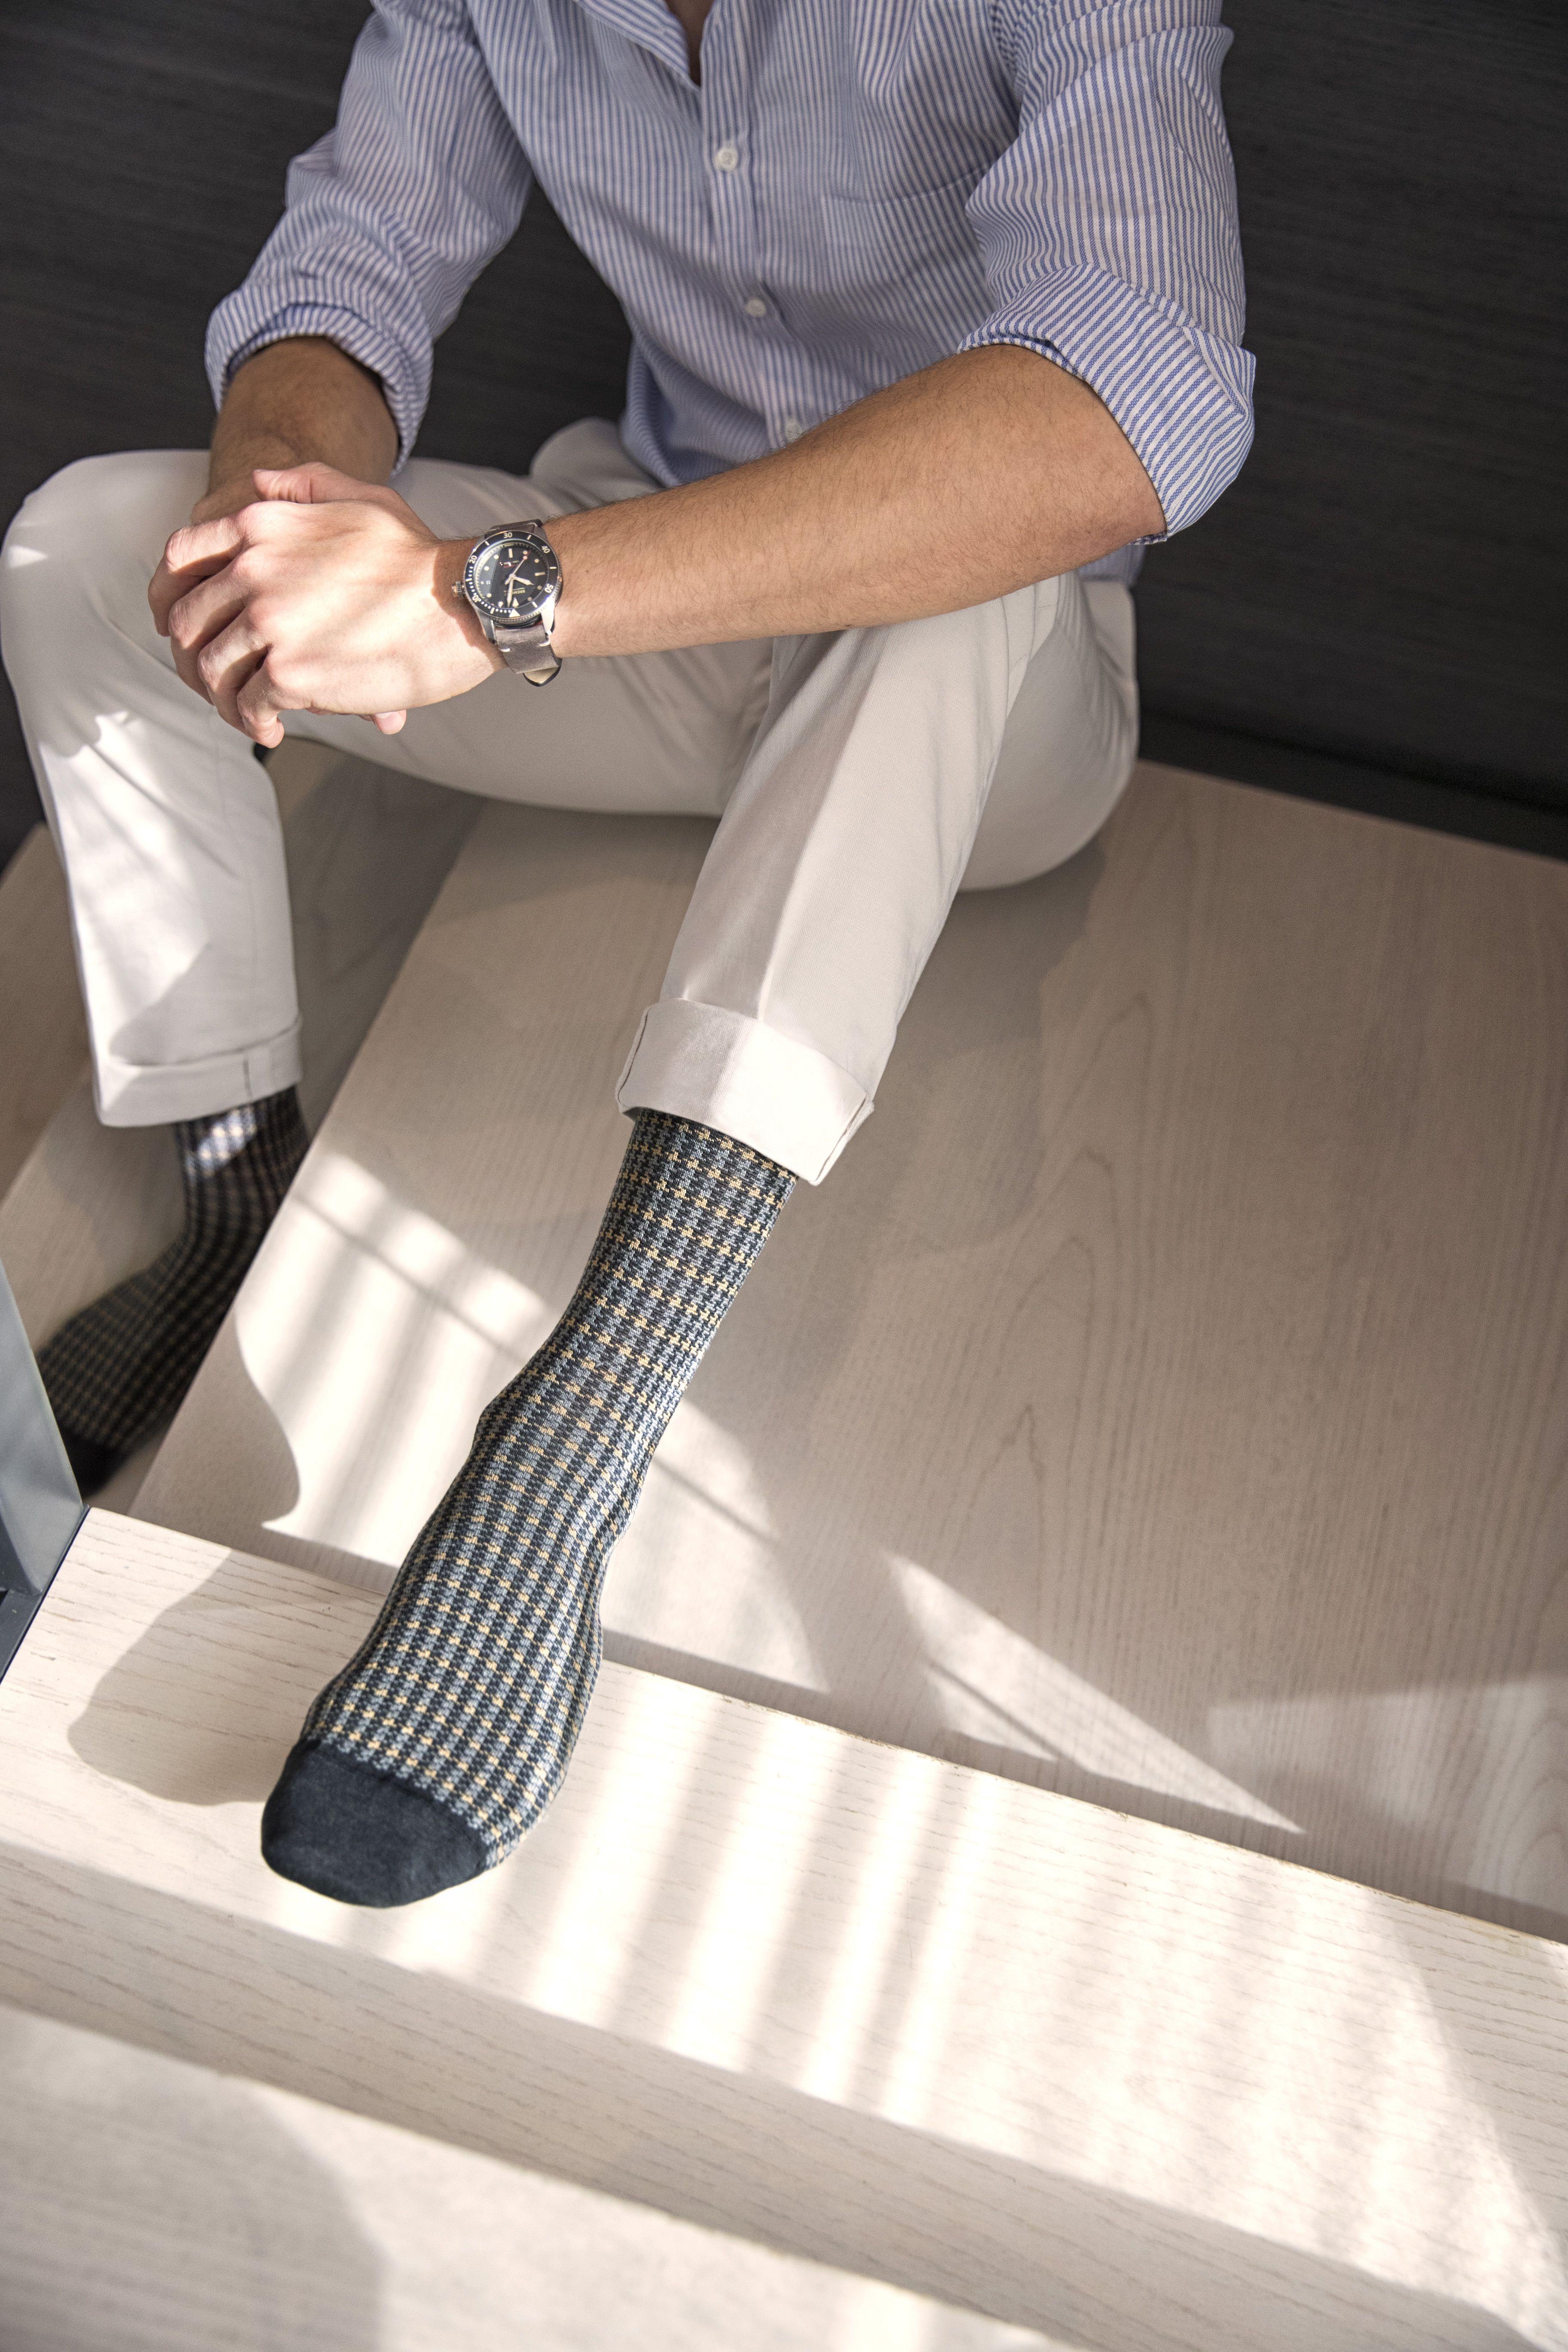 Slate Grey Espresso Socks Eleni S Shaken Stirred Collection Lsc Mens Dress Socks Fashion Socks Mens Socks [ 5472 x 3648 Pixel ]